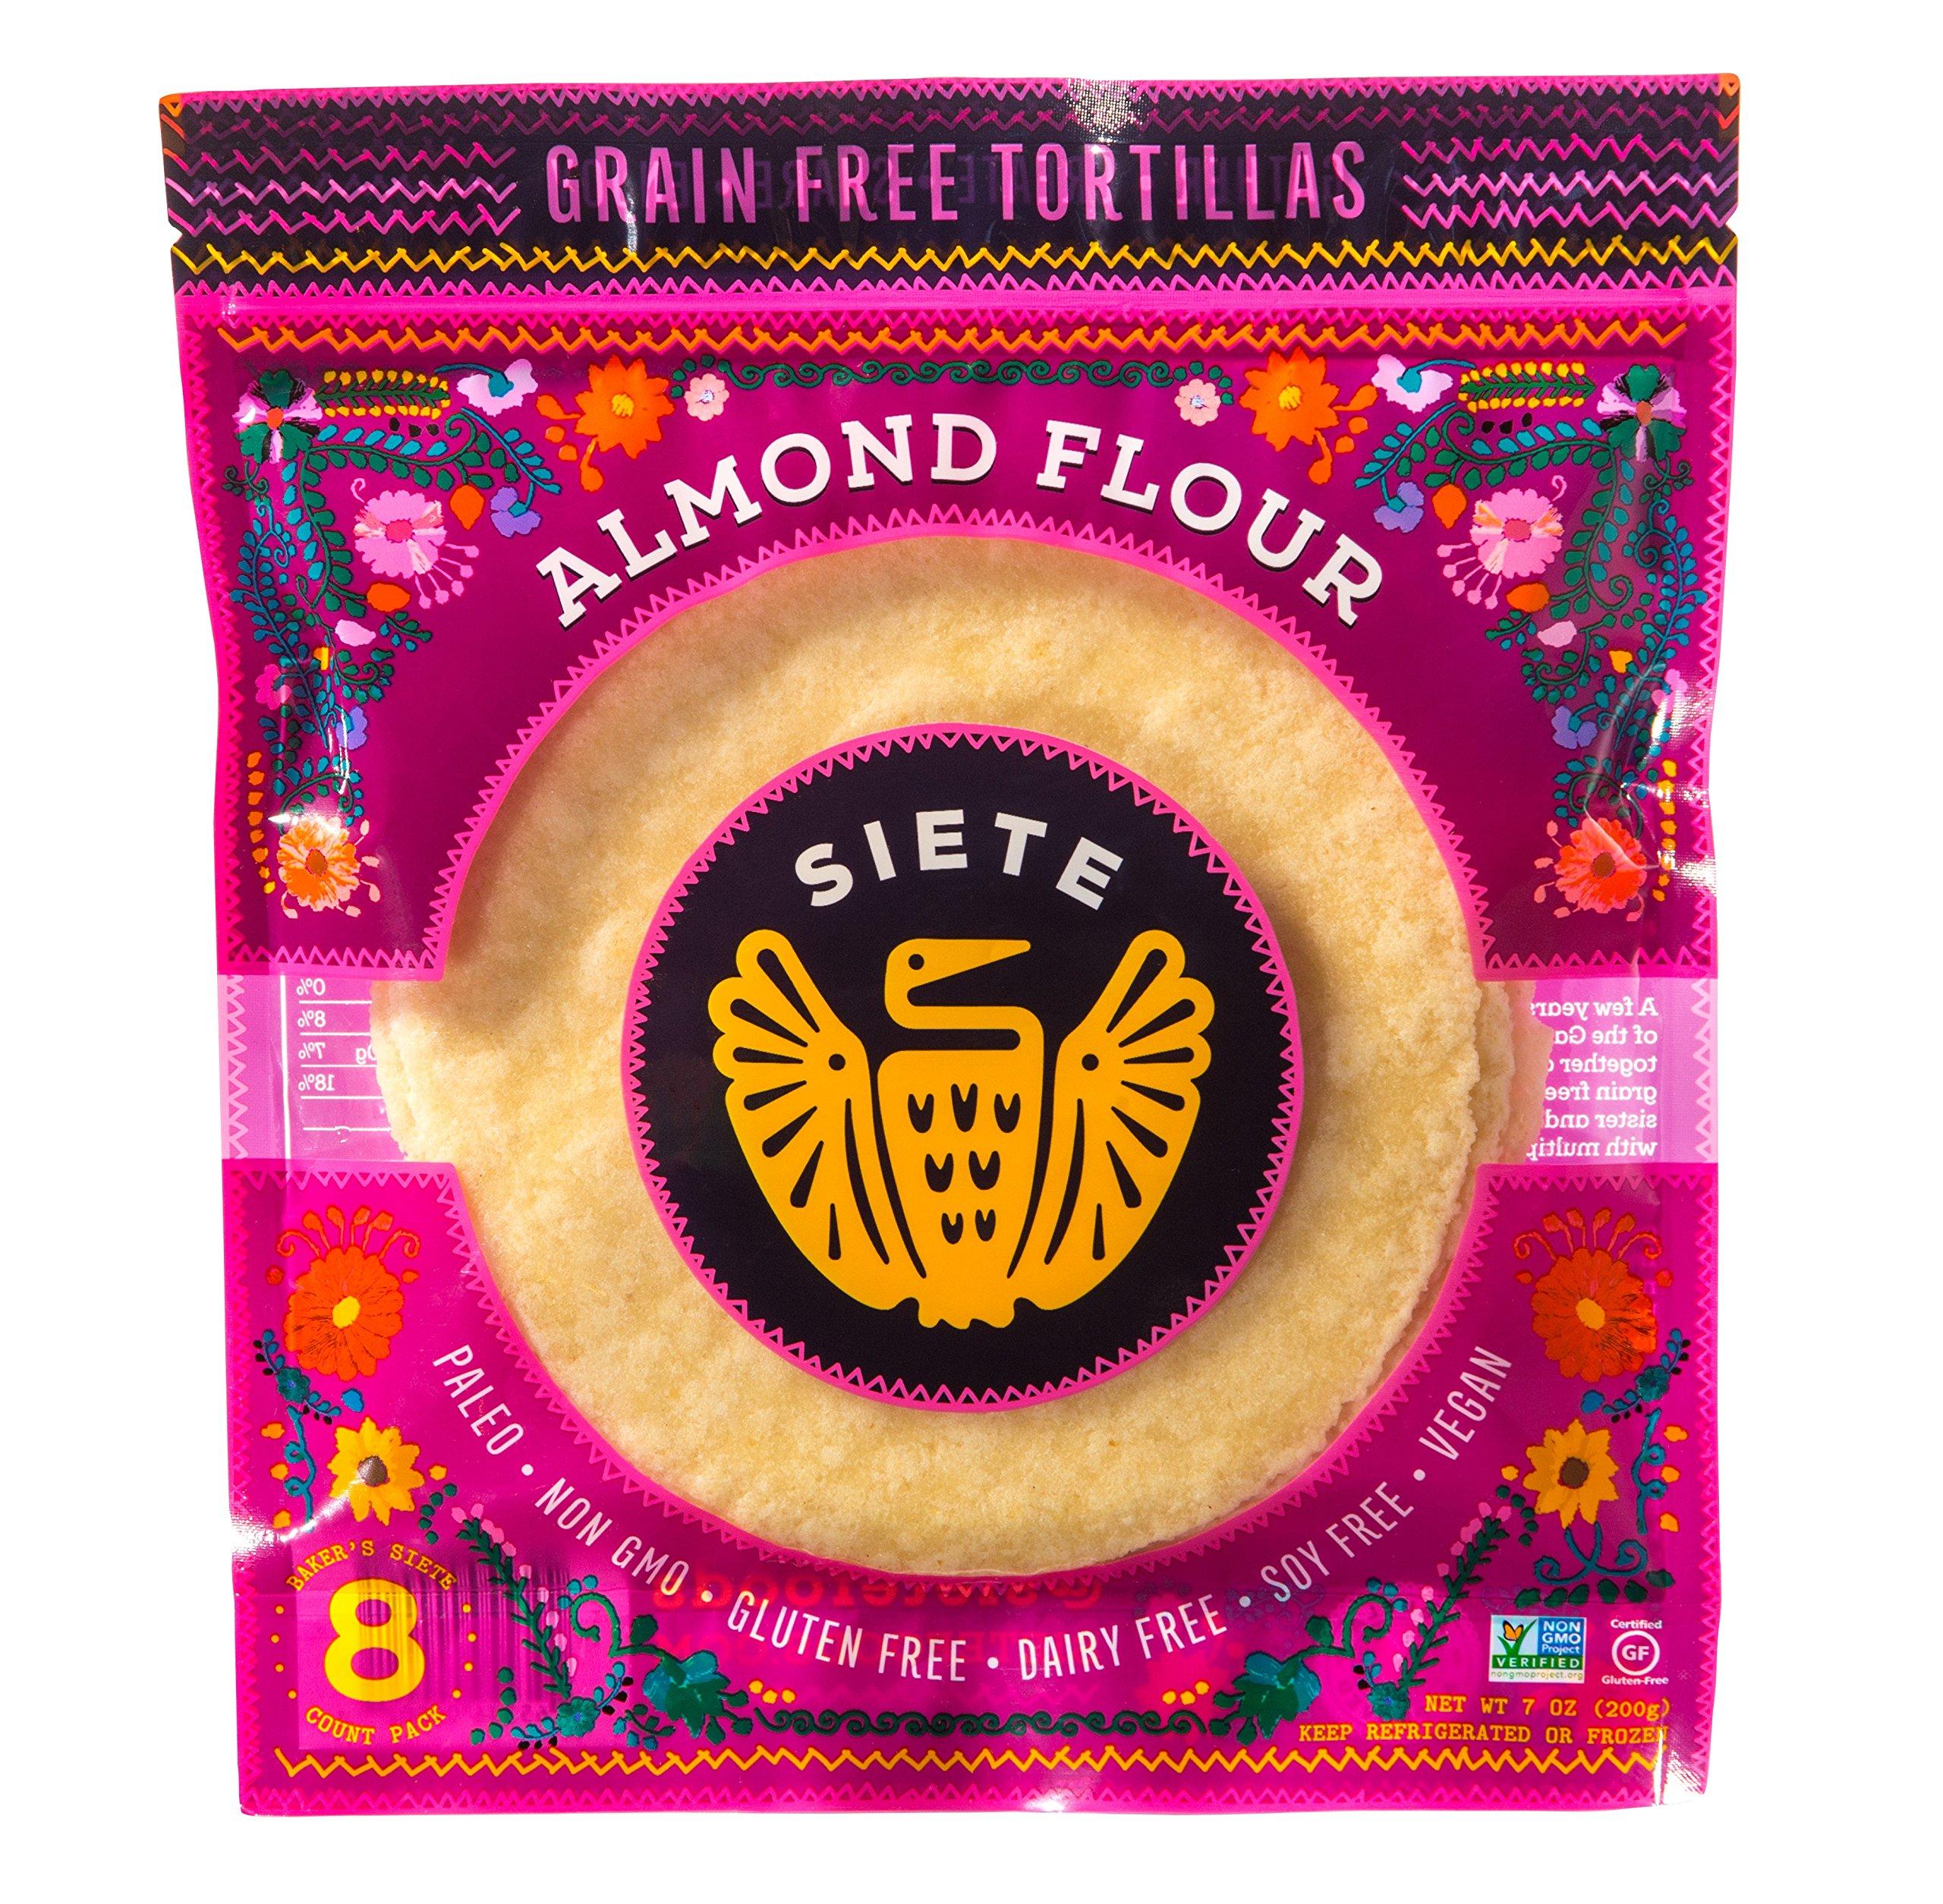 Siete Almond Flour Grain Free Tortillas, 8 Tortillas Per Pack, 2-Pack, 16 Tortillas by Siete